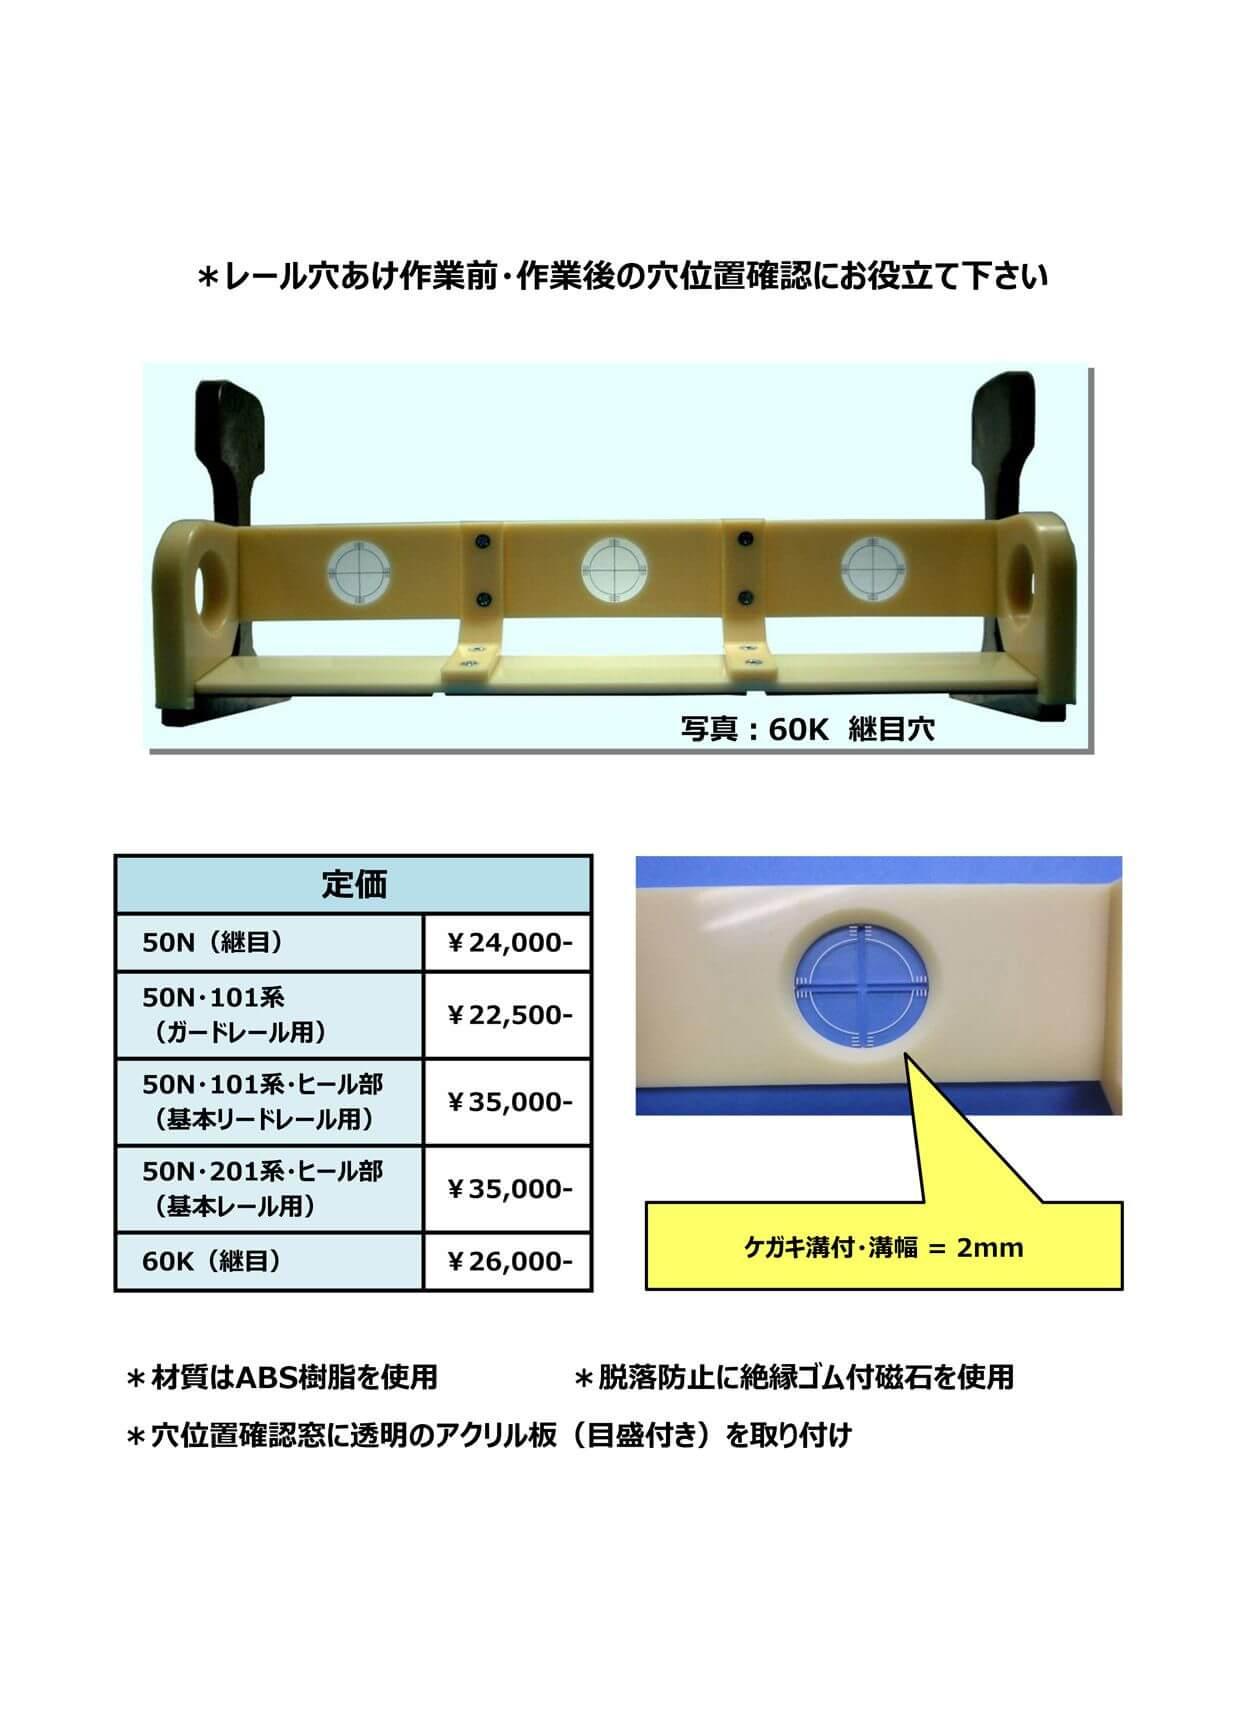 レール継目穴検査測定器